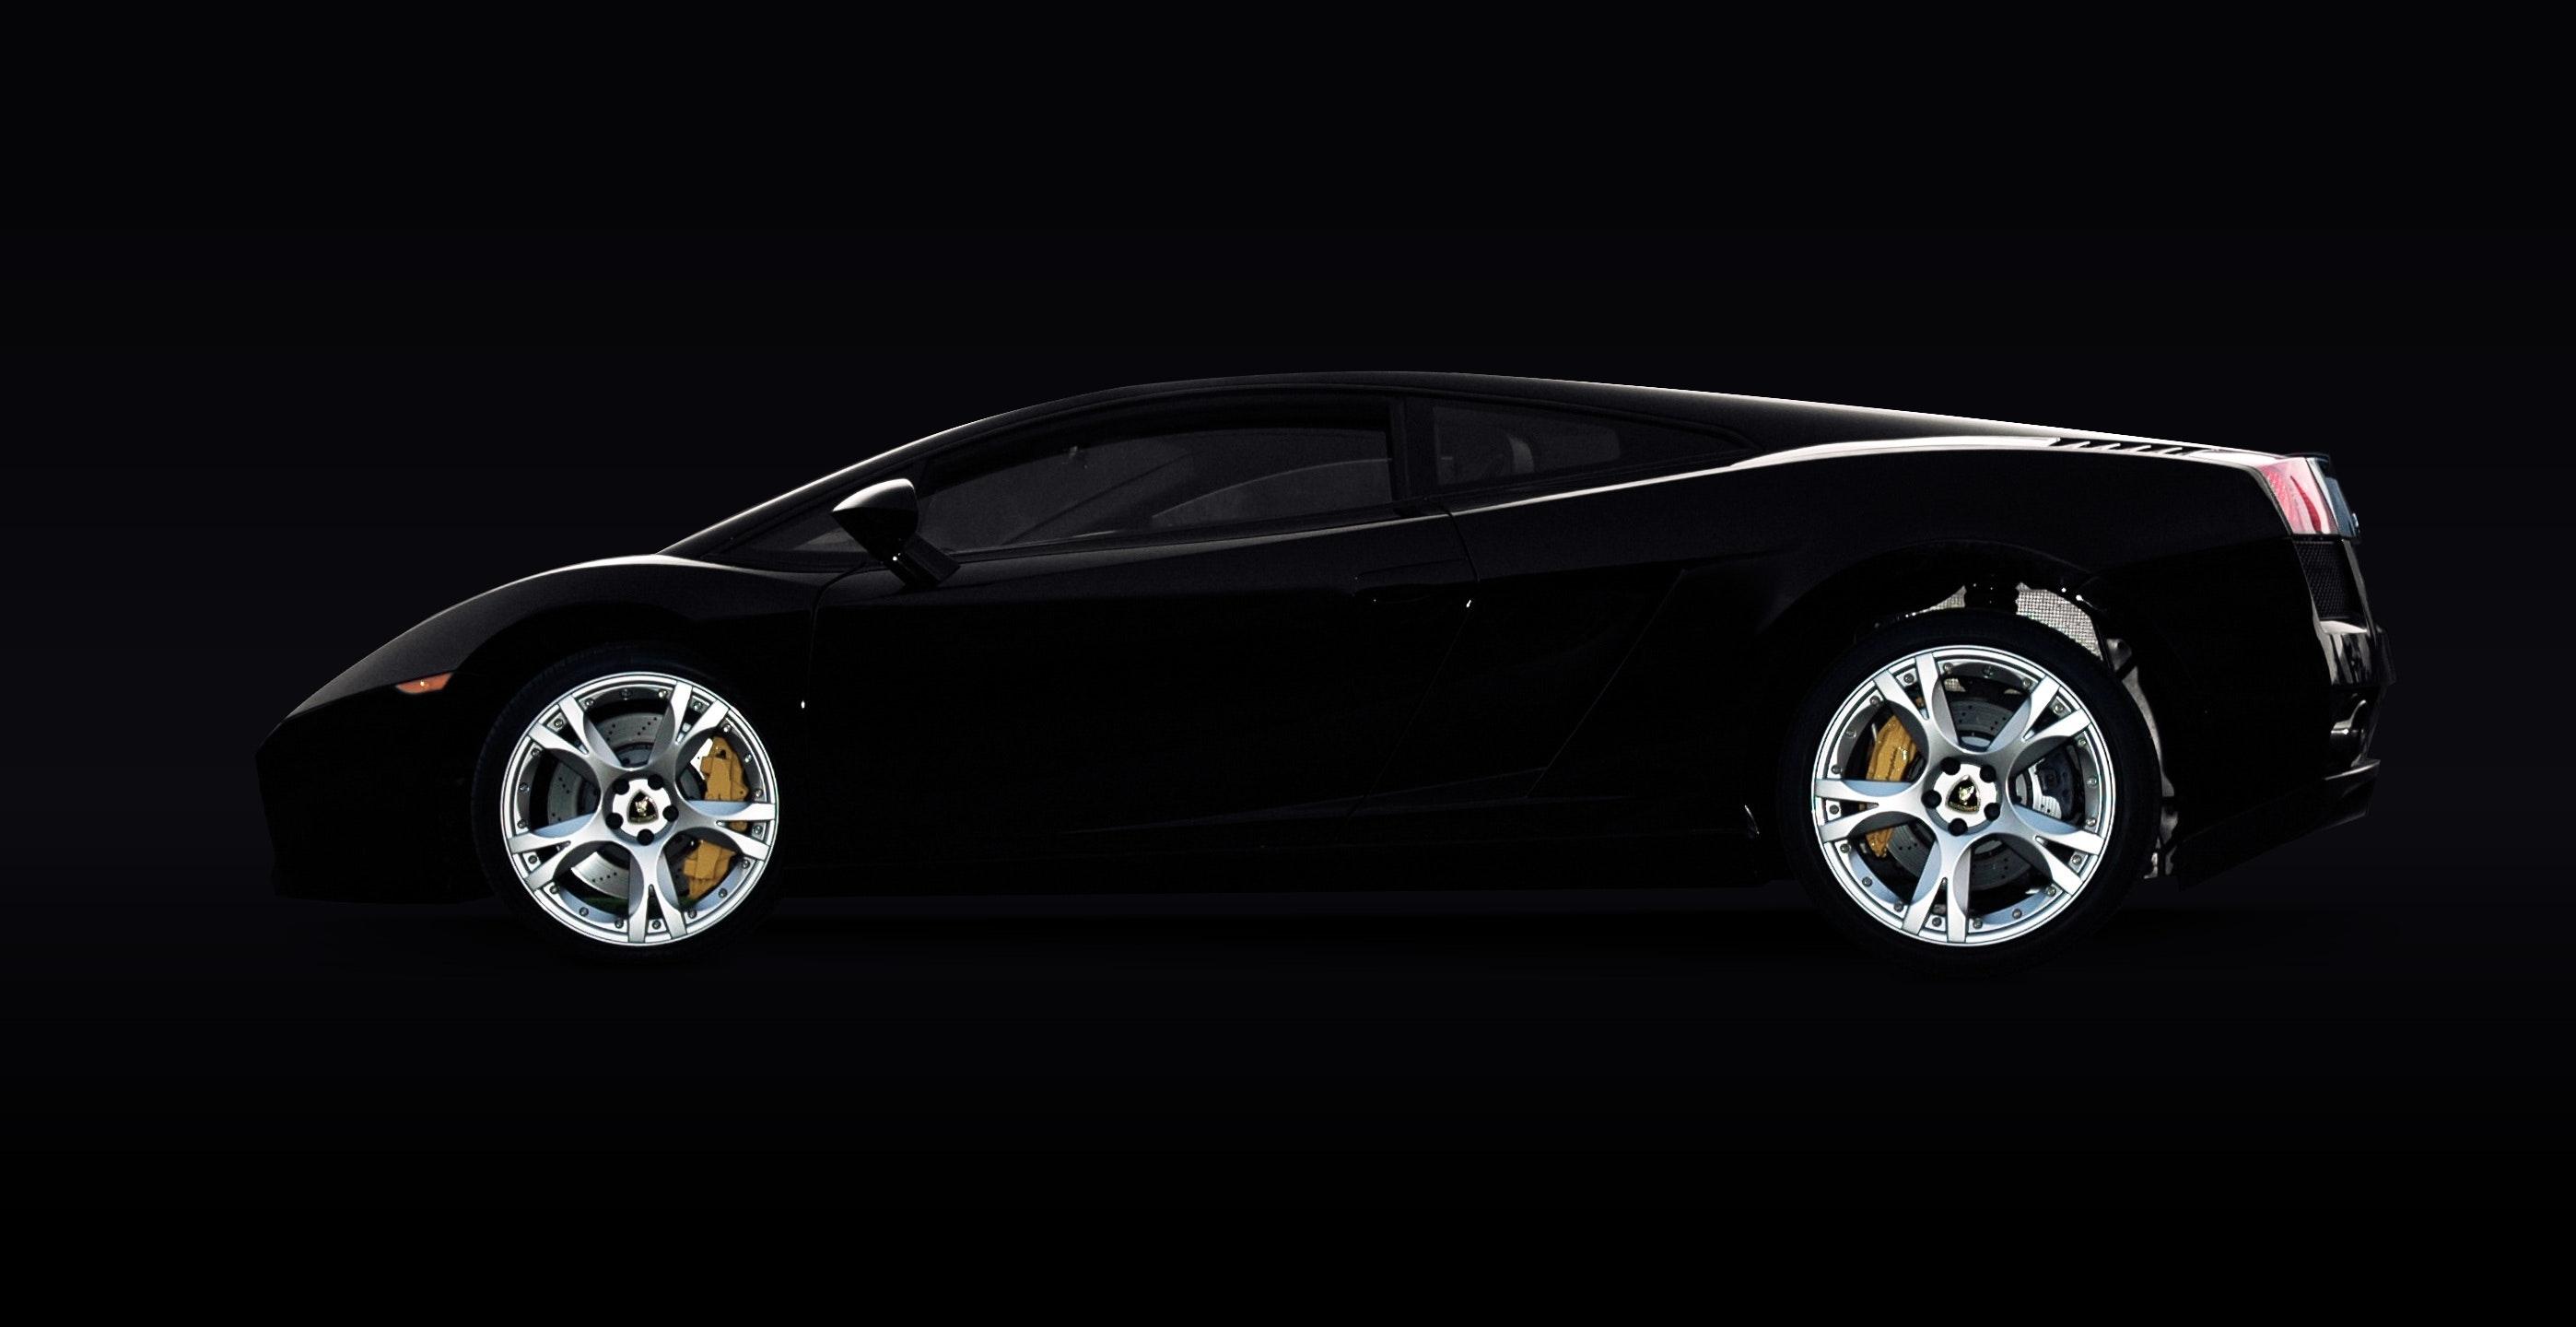 Black Lamborghini Murcielago Free Stock Photo